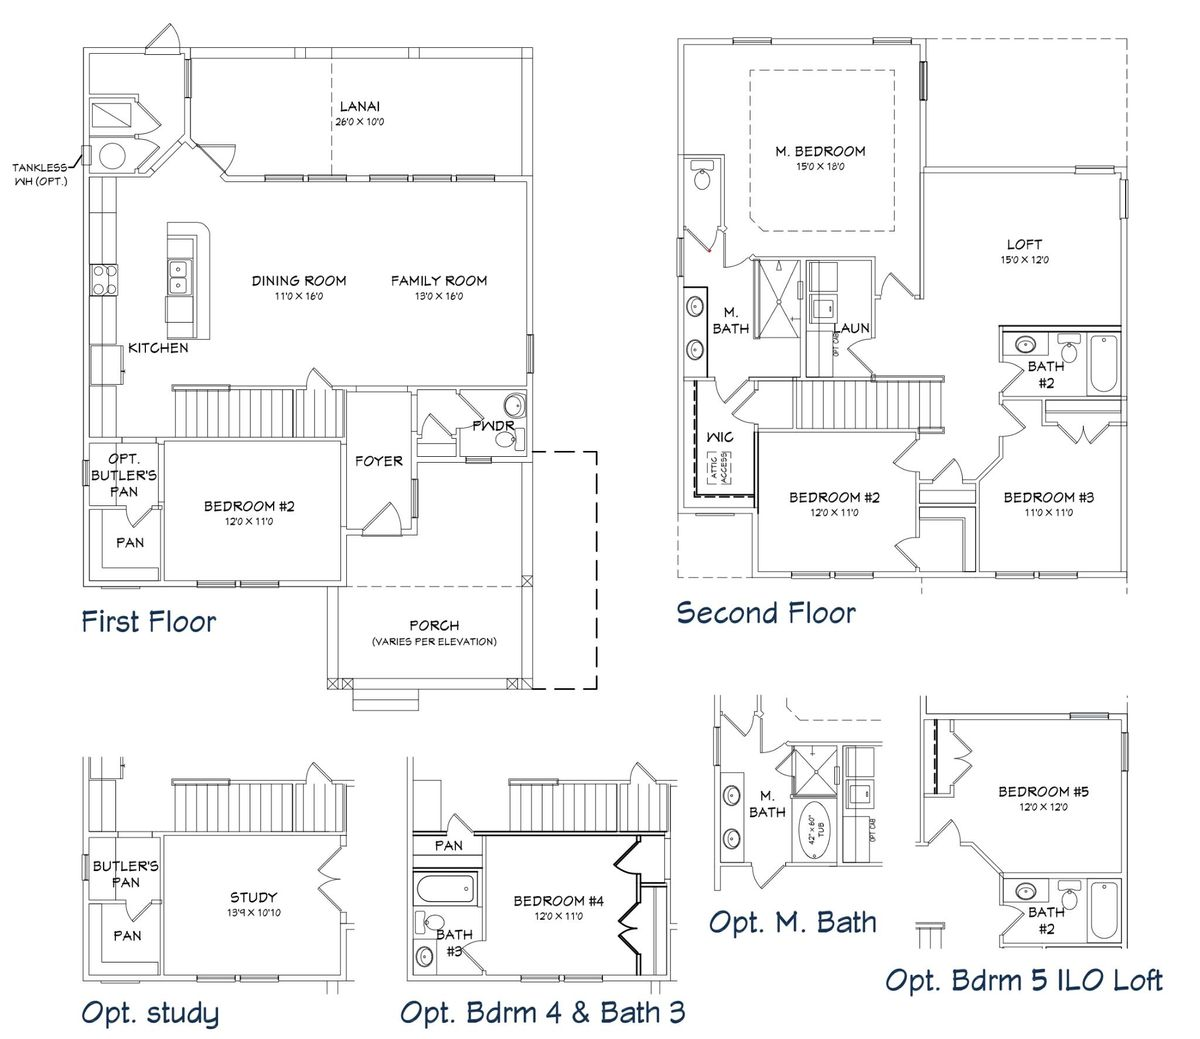 Captiva Floor Plan